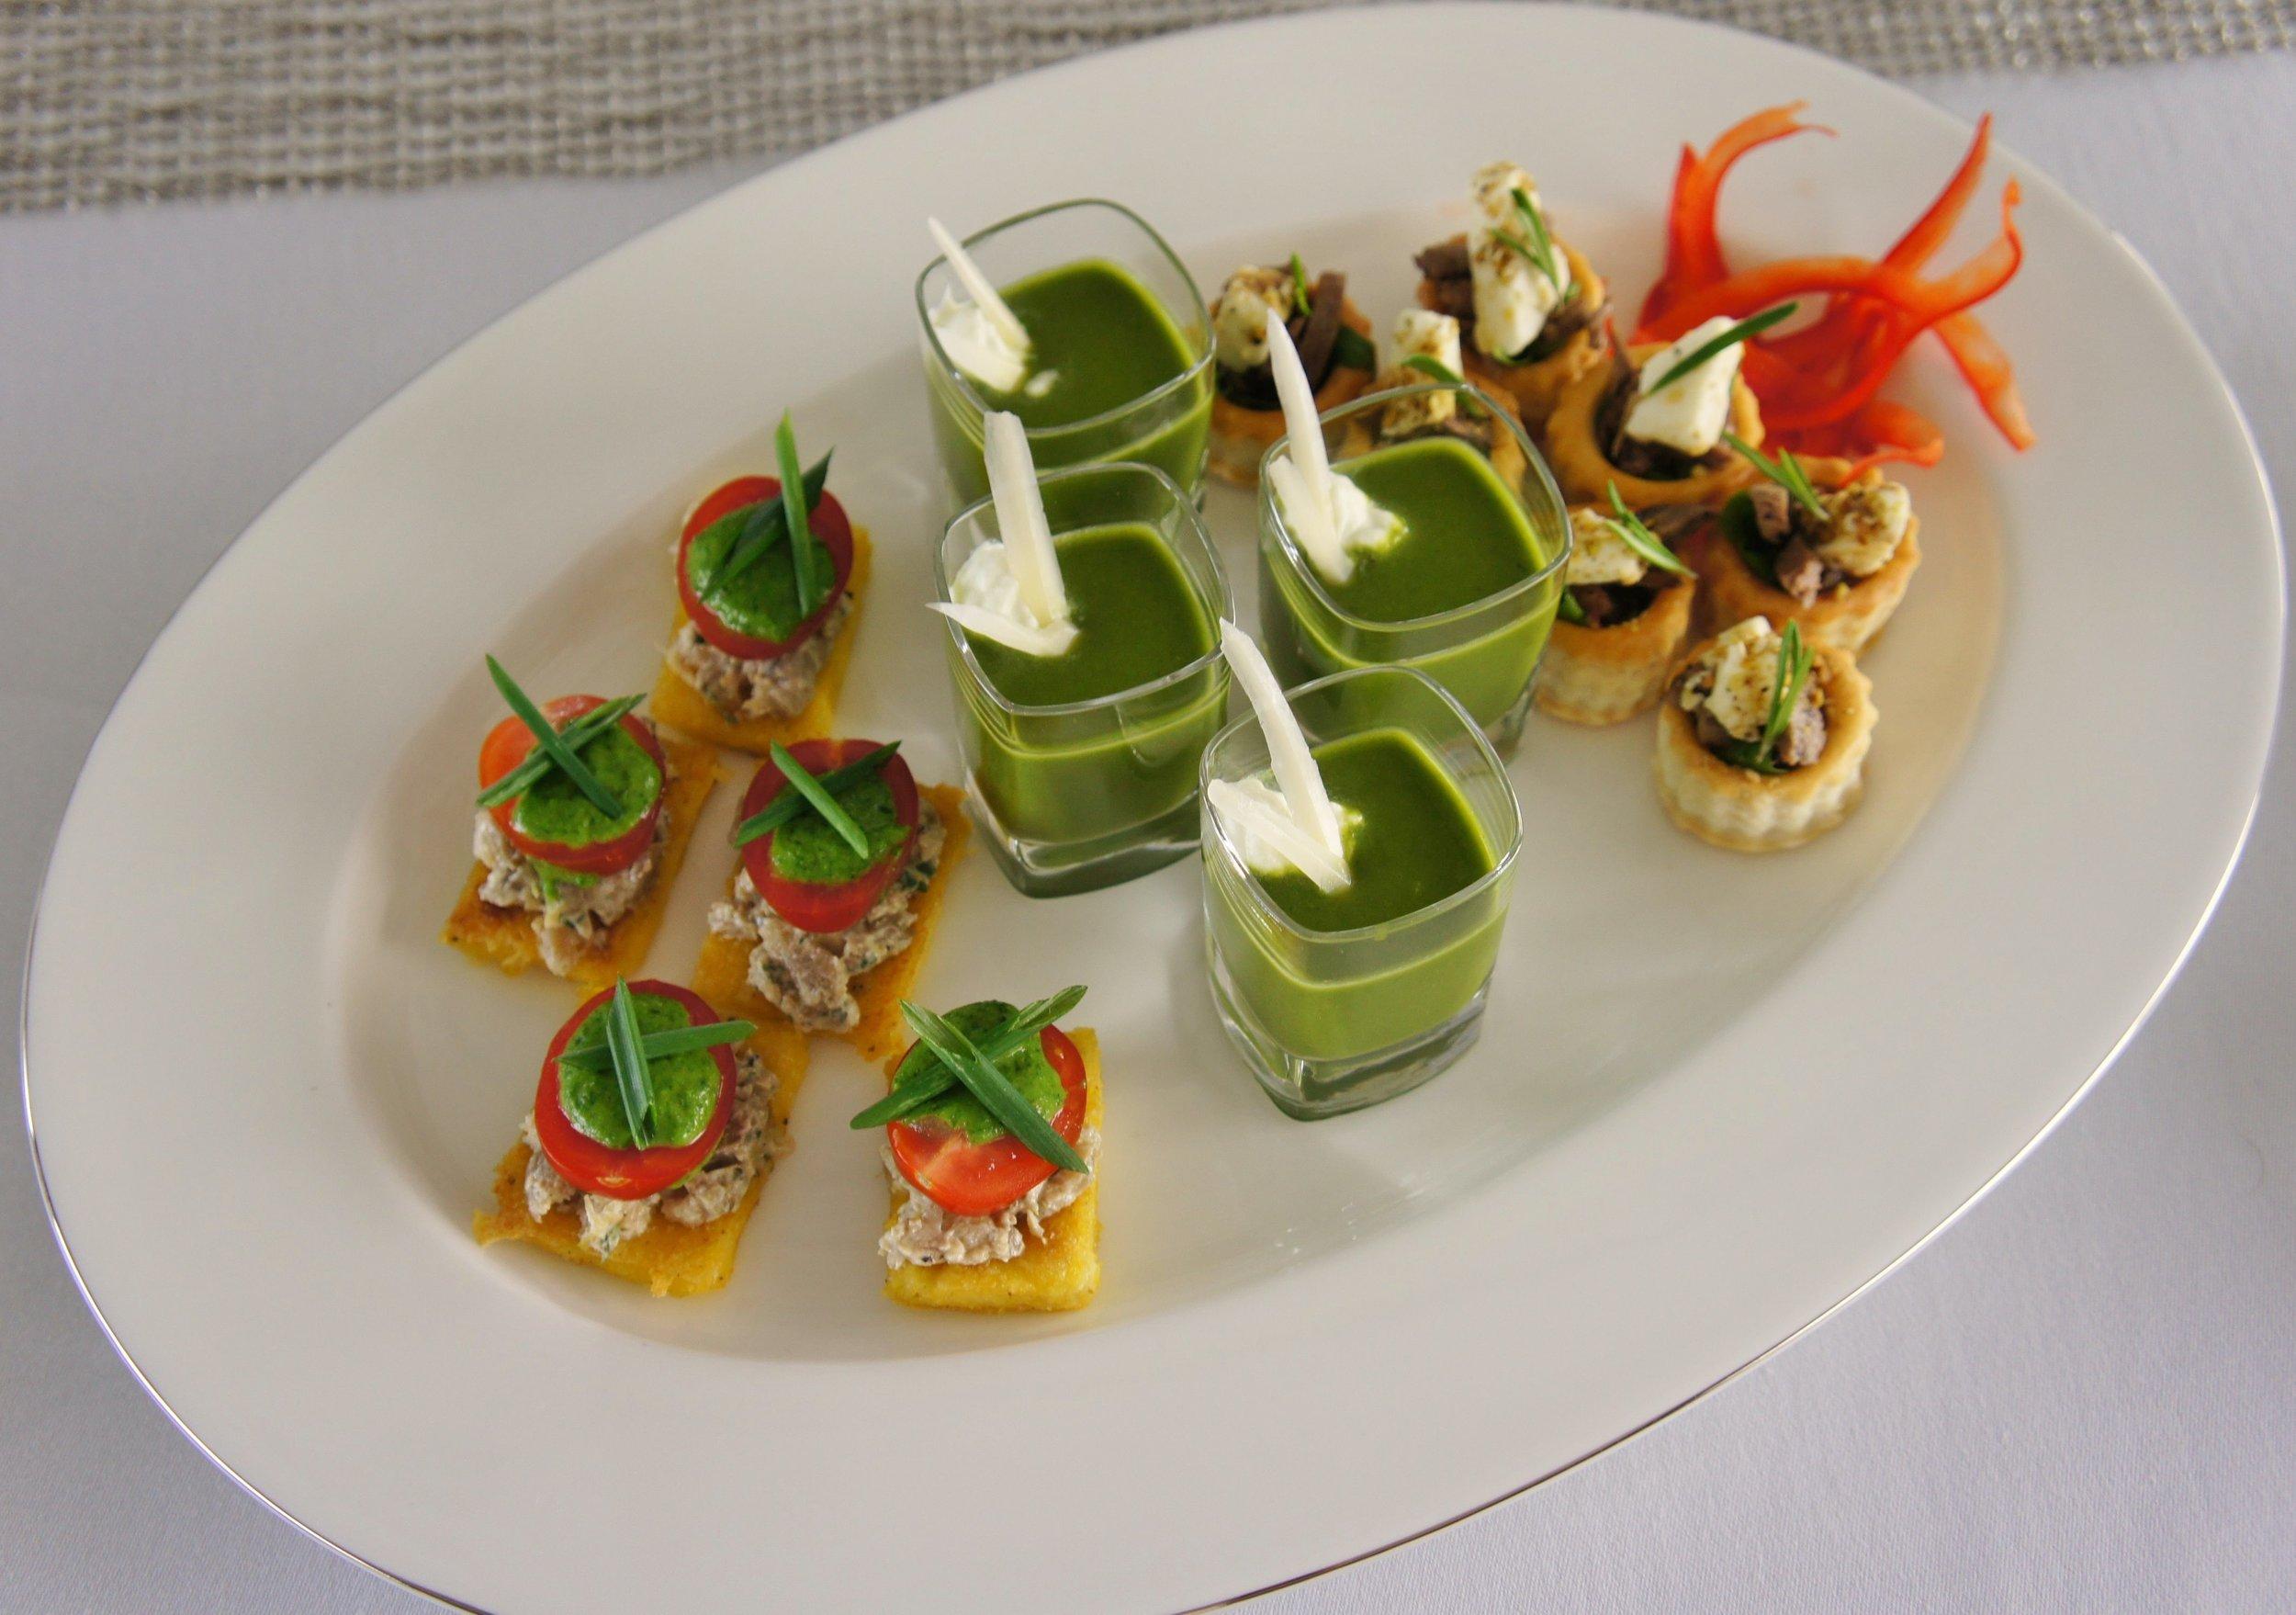 yacht-11-11-food-07.jpg